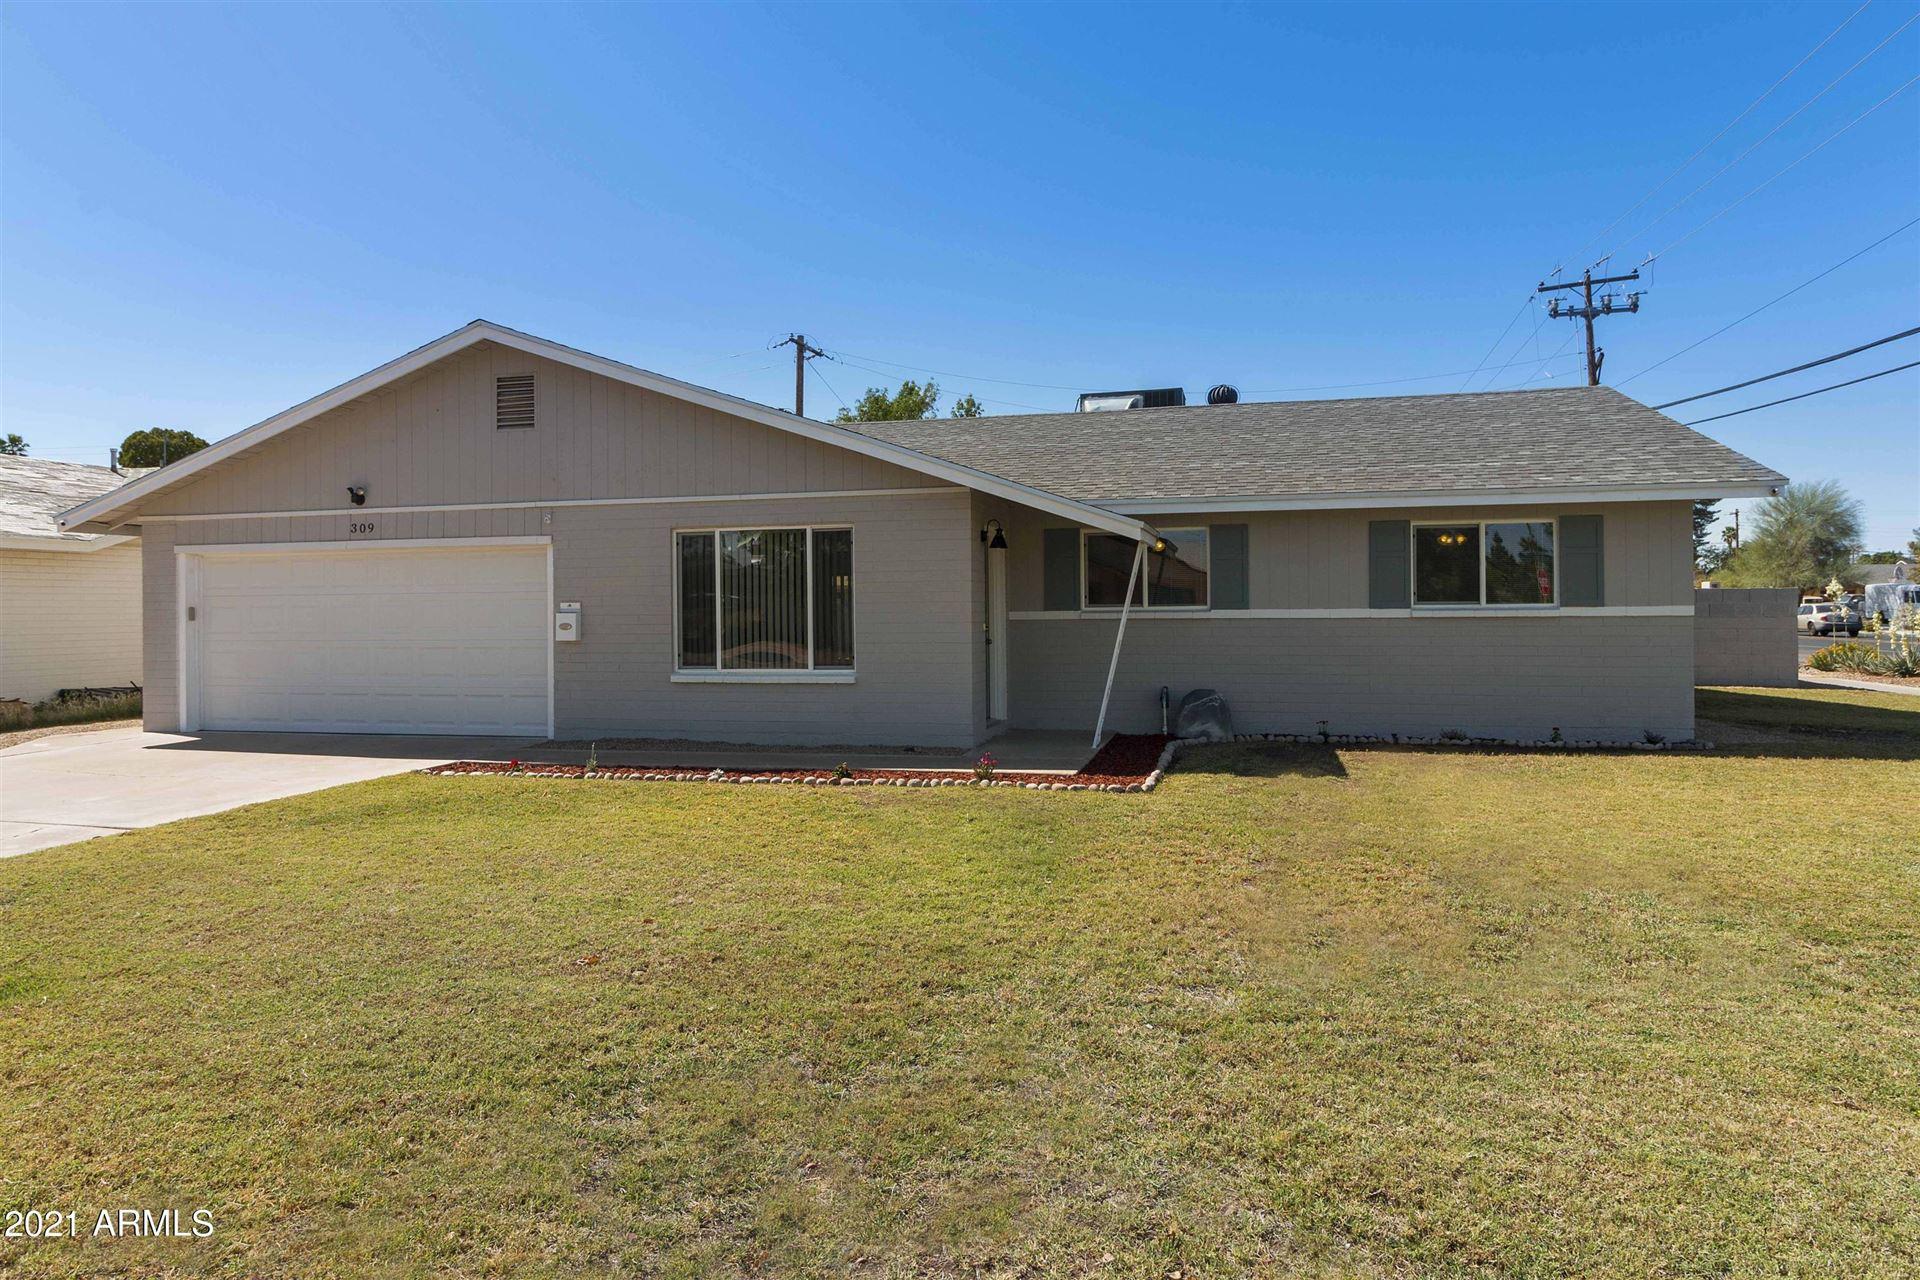 Photo of 309 E LAGUNA Drive, Tempe, AZ 85282 (MLS # 6231300)